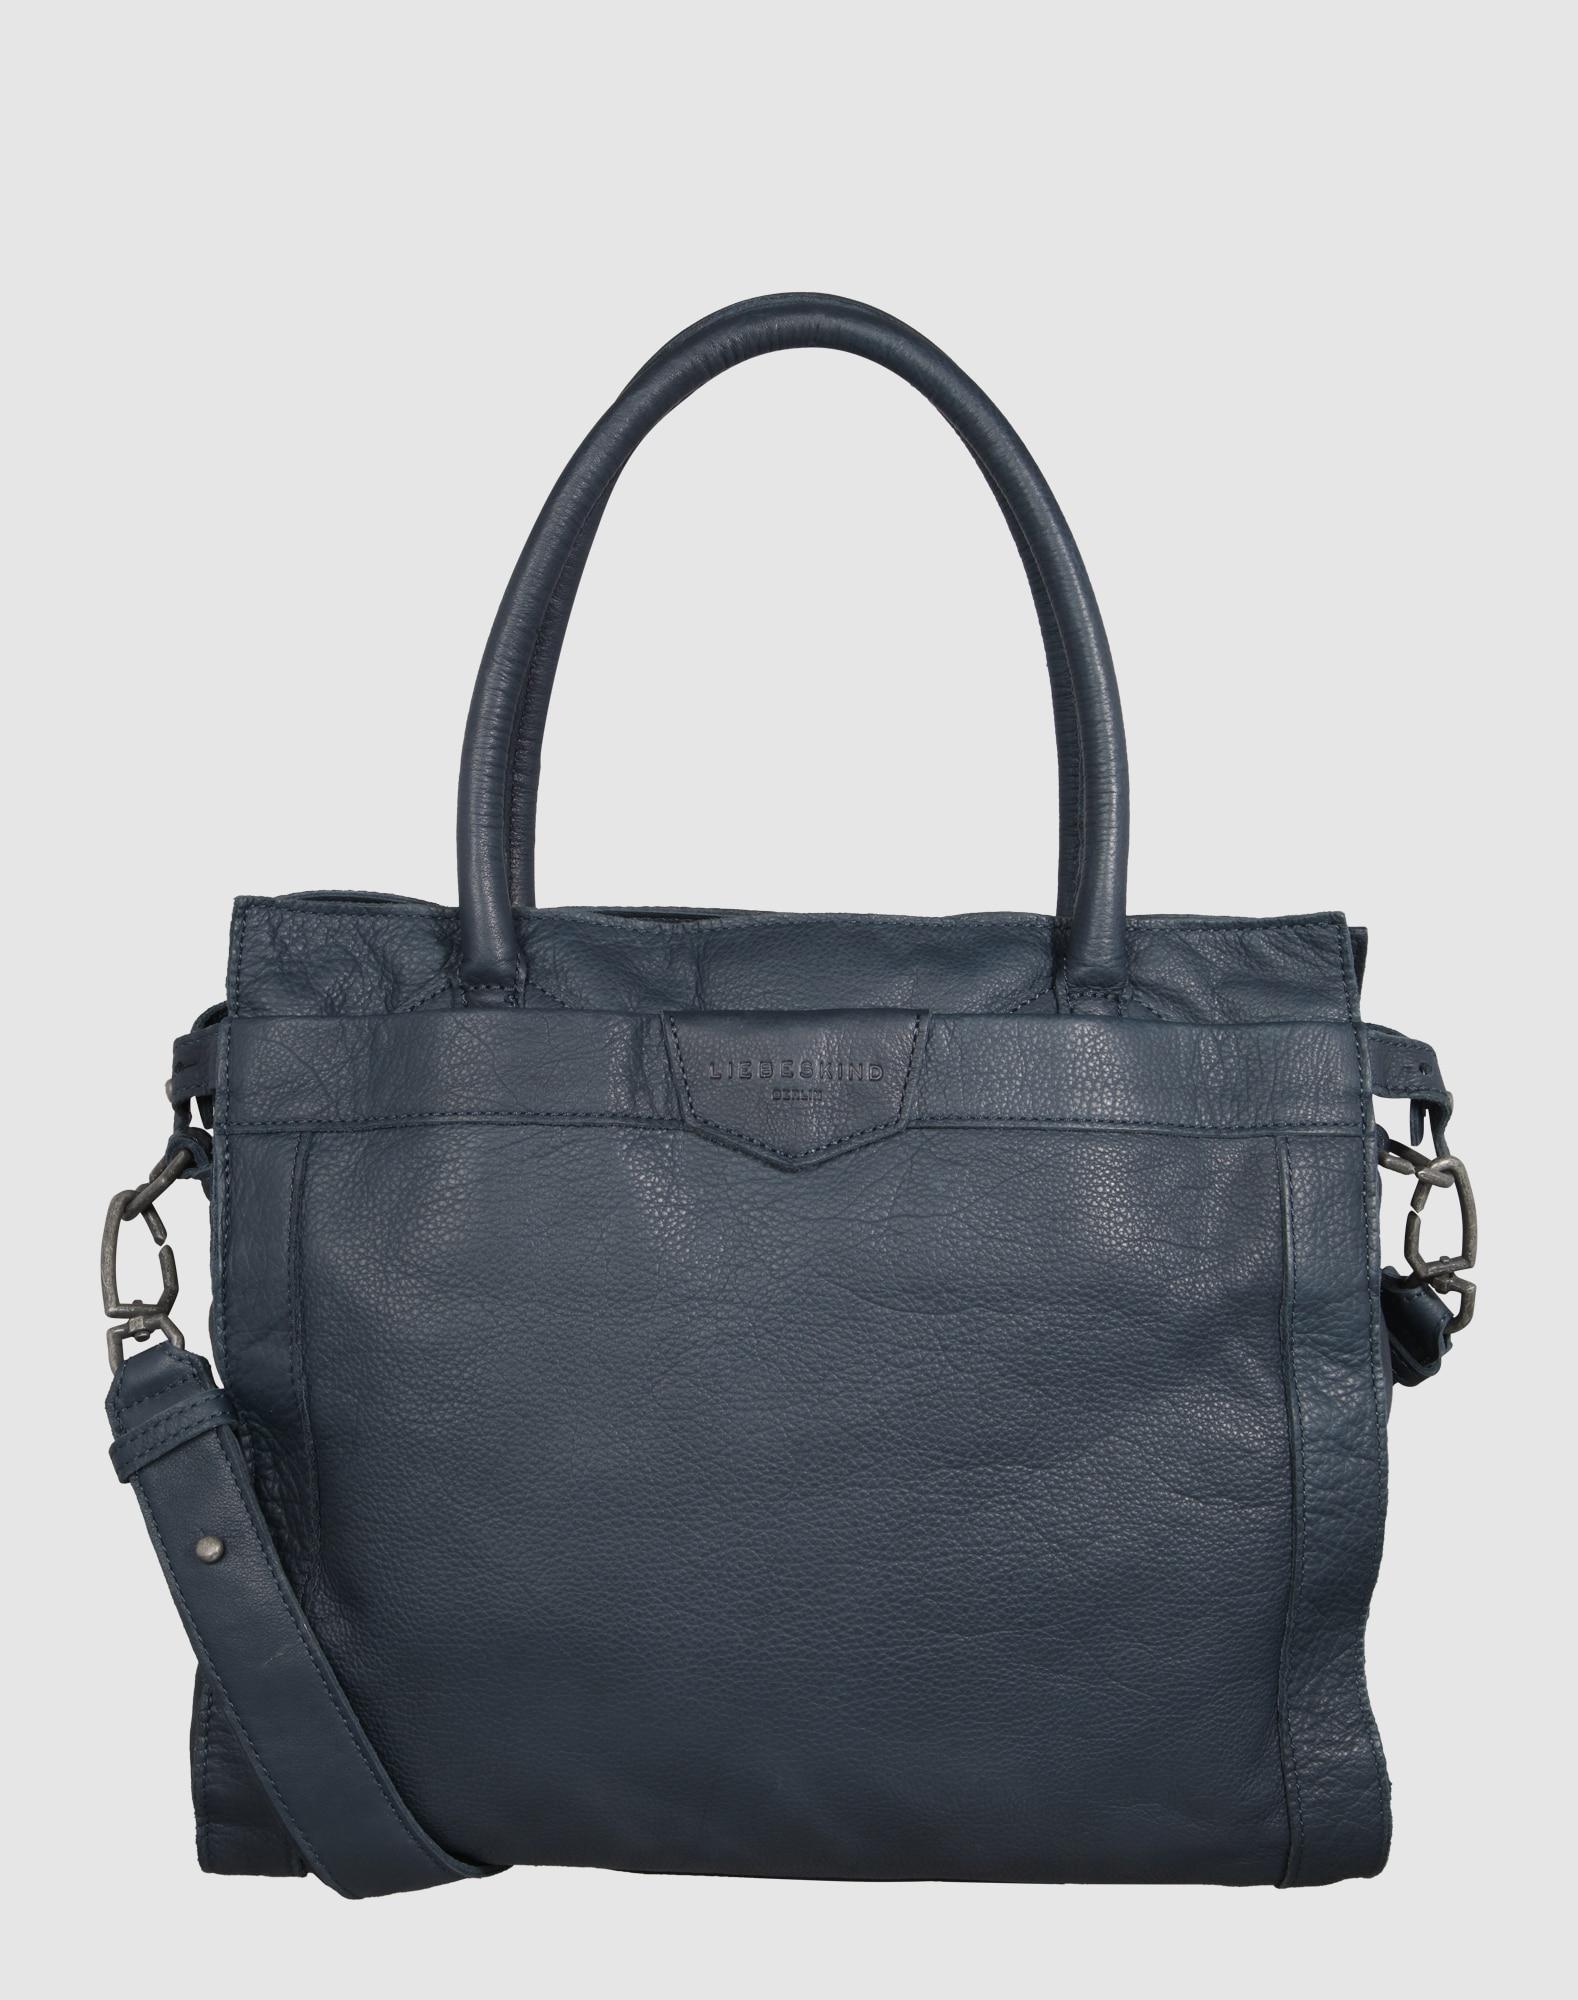 liebeskind berlin handtasche 39 glory7 39 in blau about you. Black Bedroom Furniture Sets. Home Design Ideas